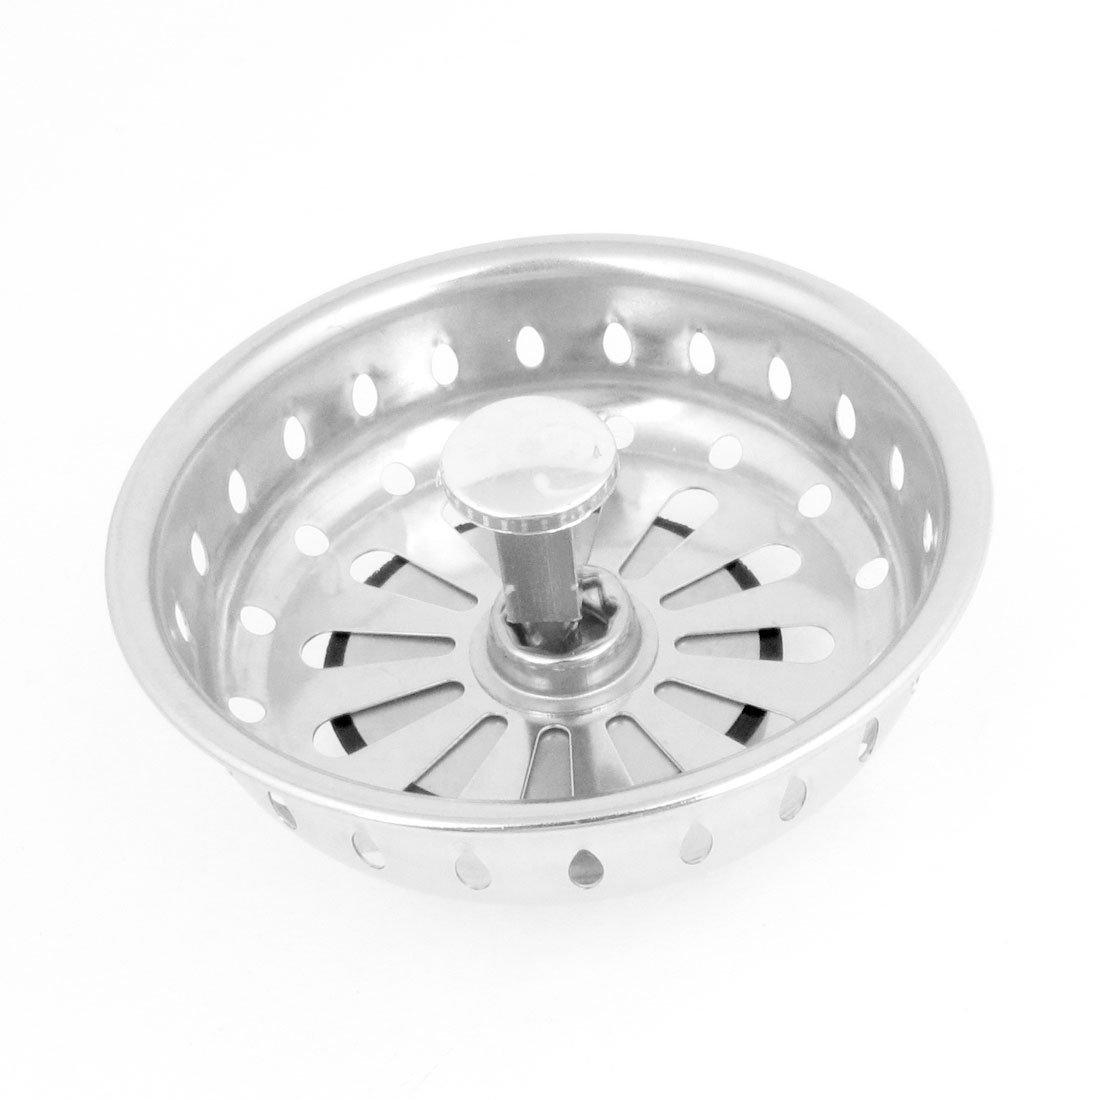 Stainless Steel Sink Drain Drainer Basket Strainer Stopper 3.2 Inch ...